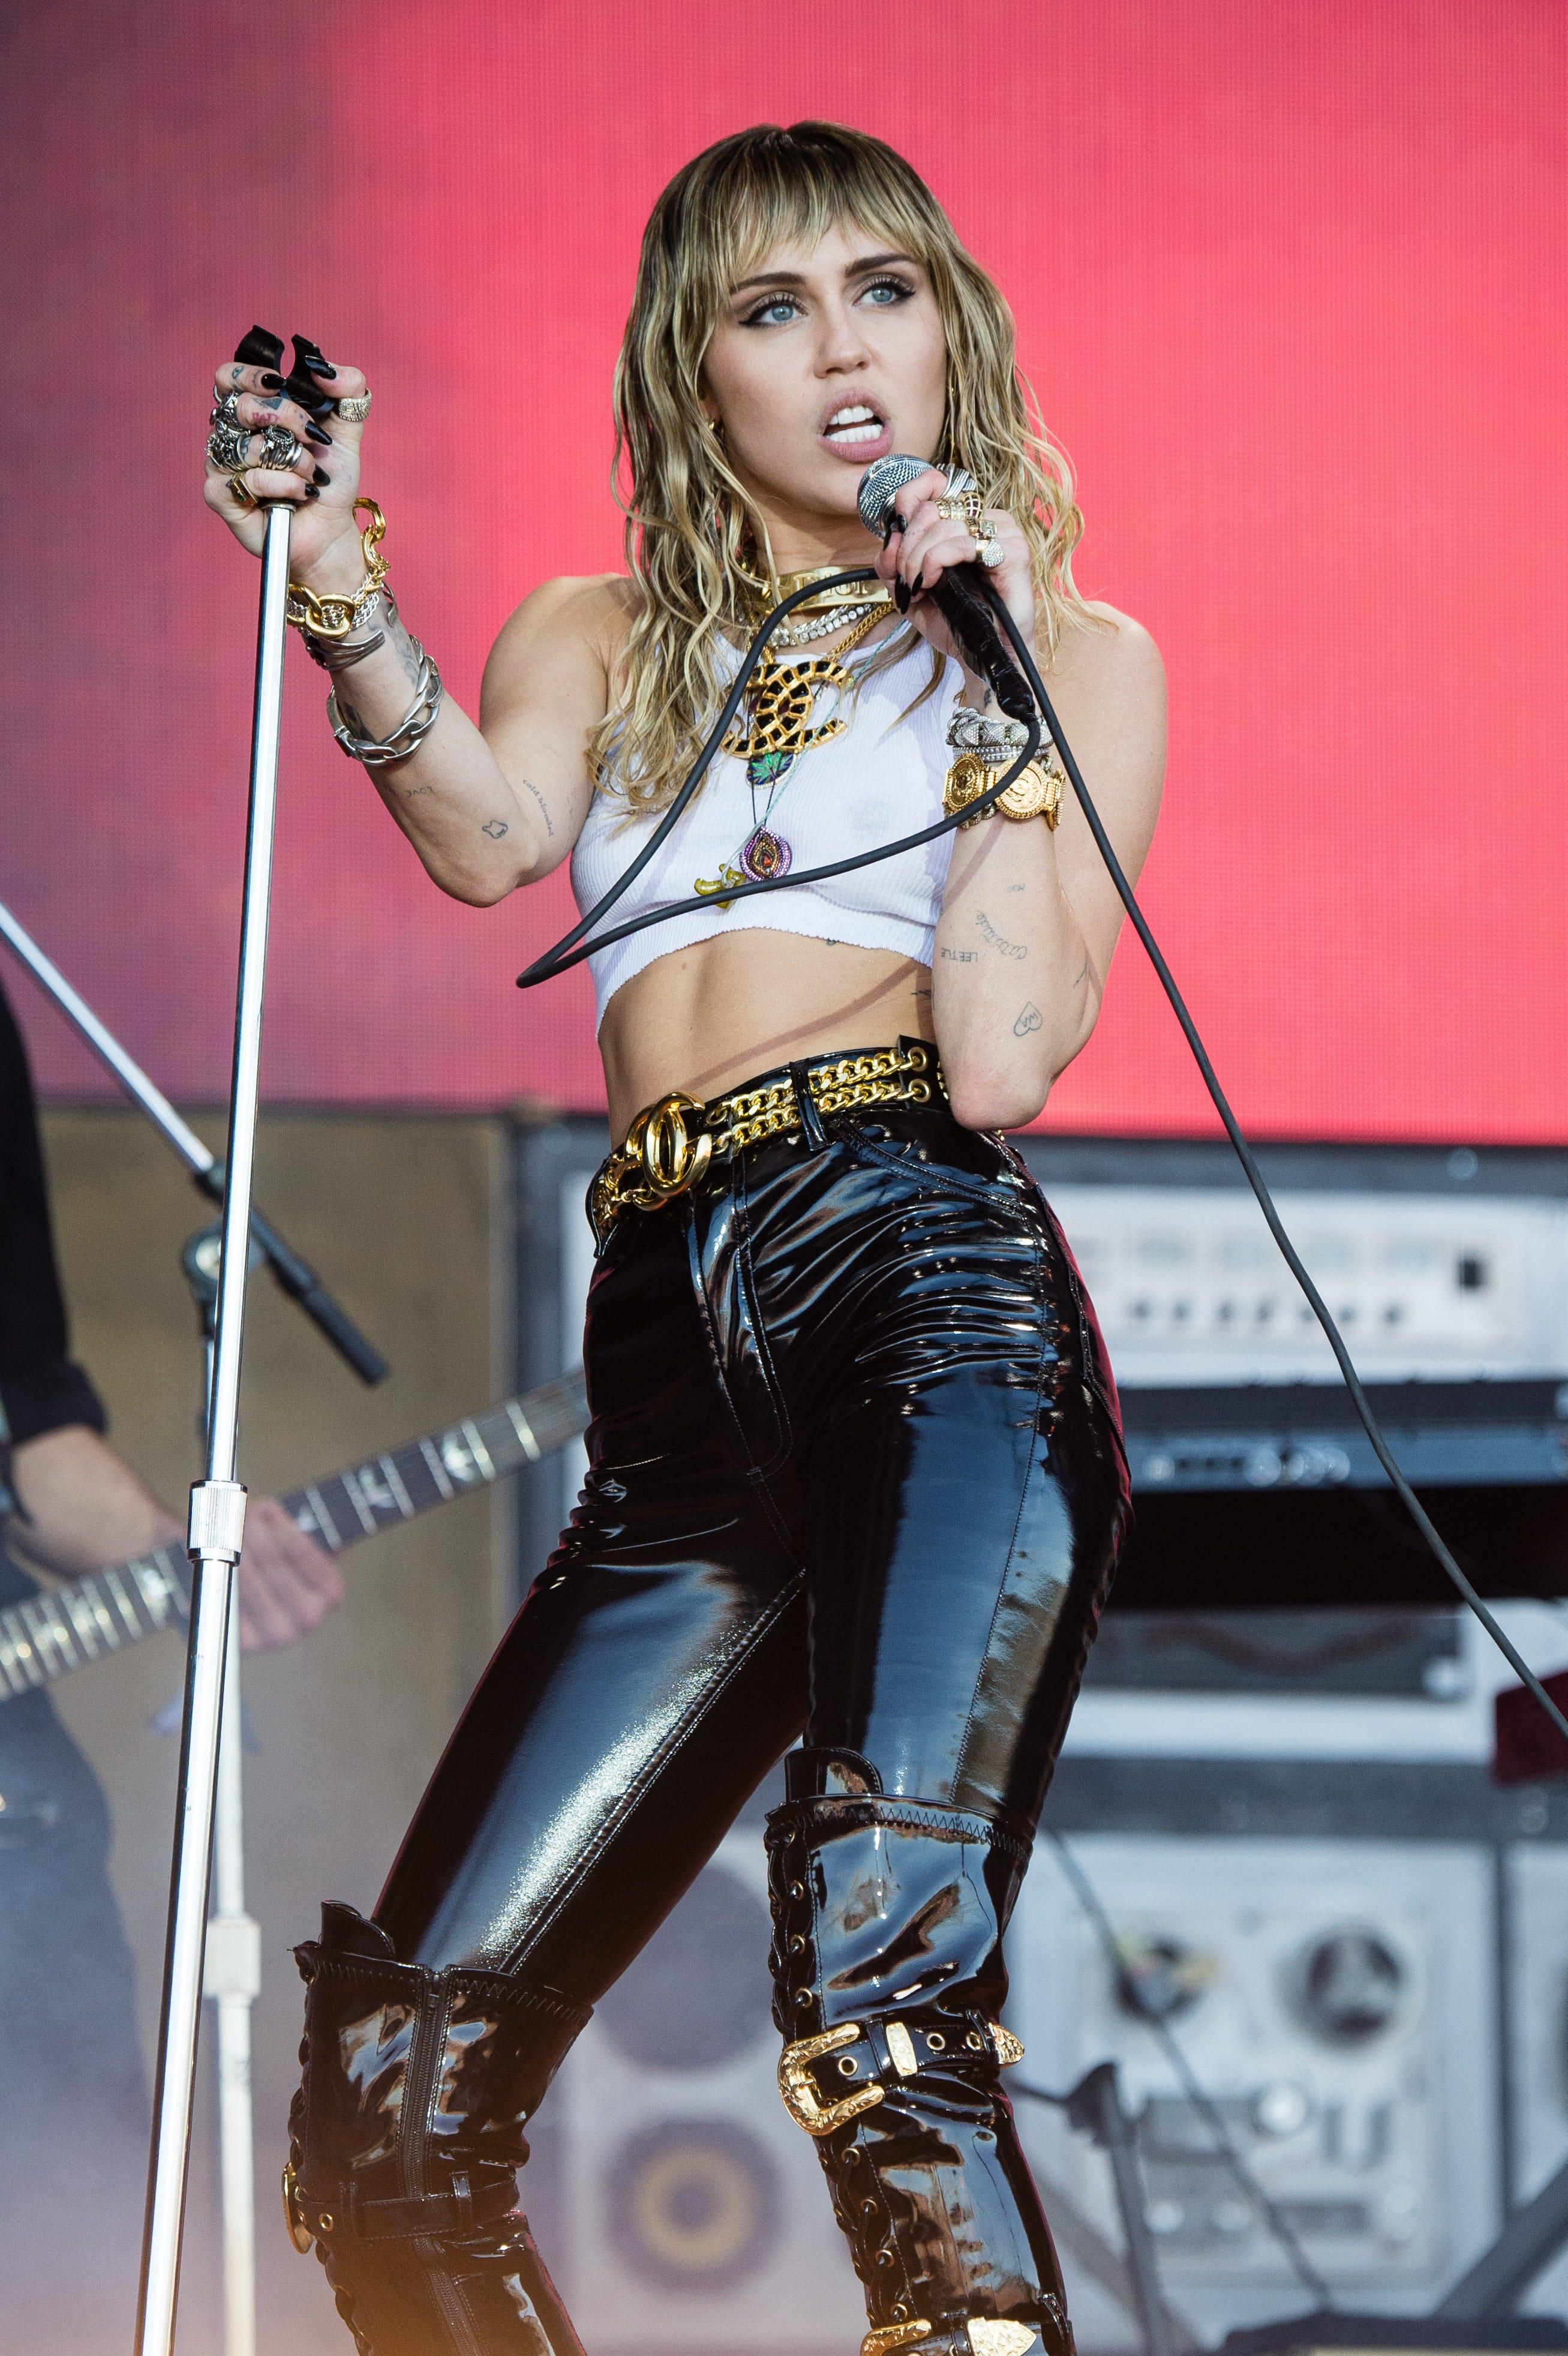 Miley Cyrus & Kaitlynn Carter Gave Brody Jenner The Most On-Brand Birthday Present